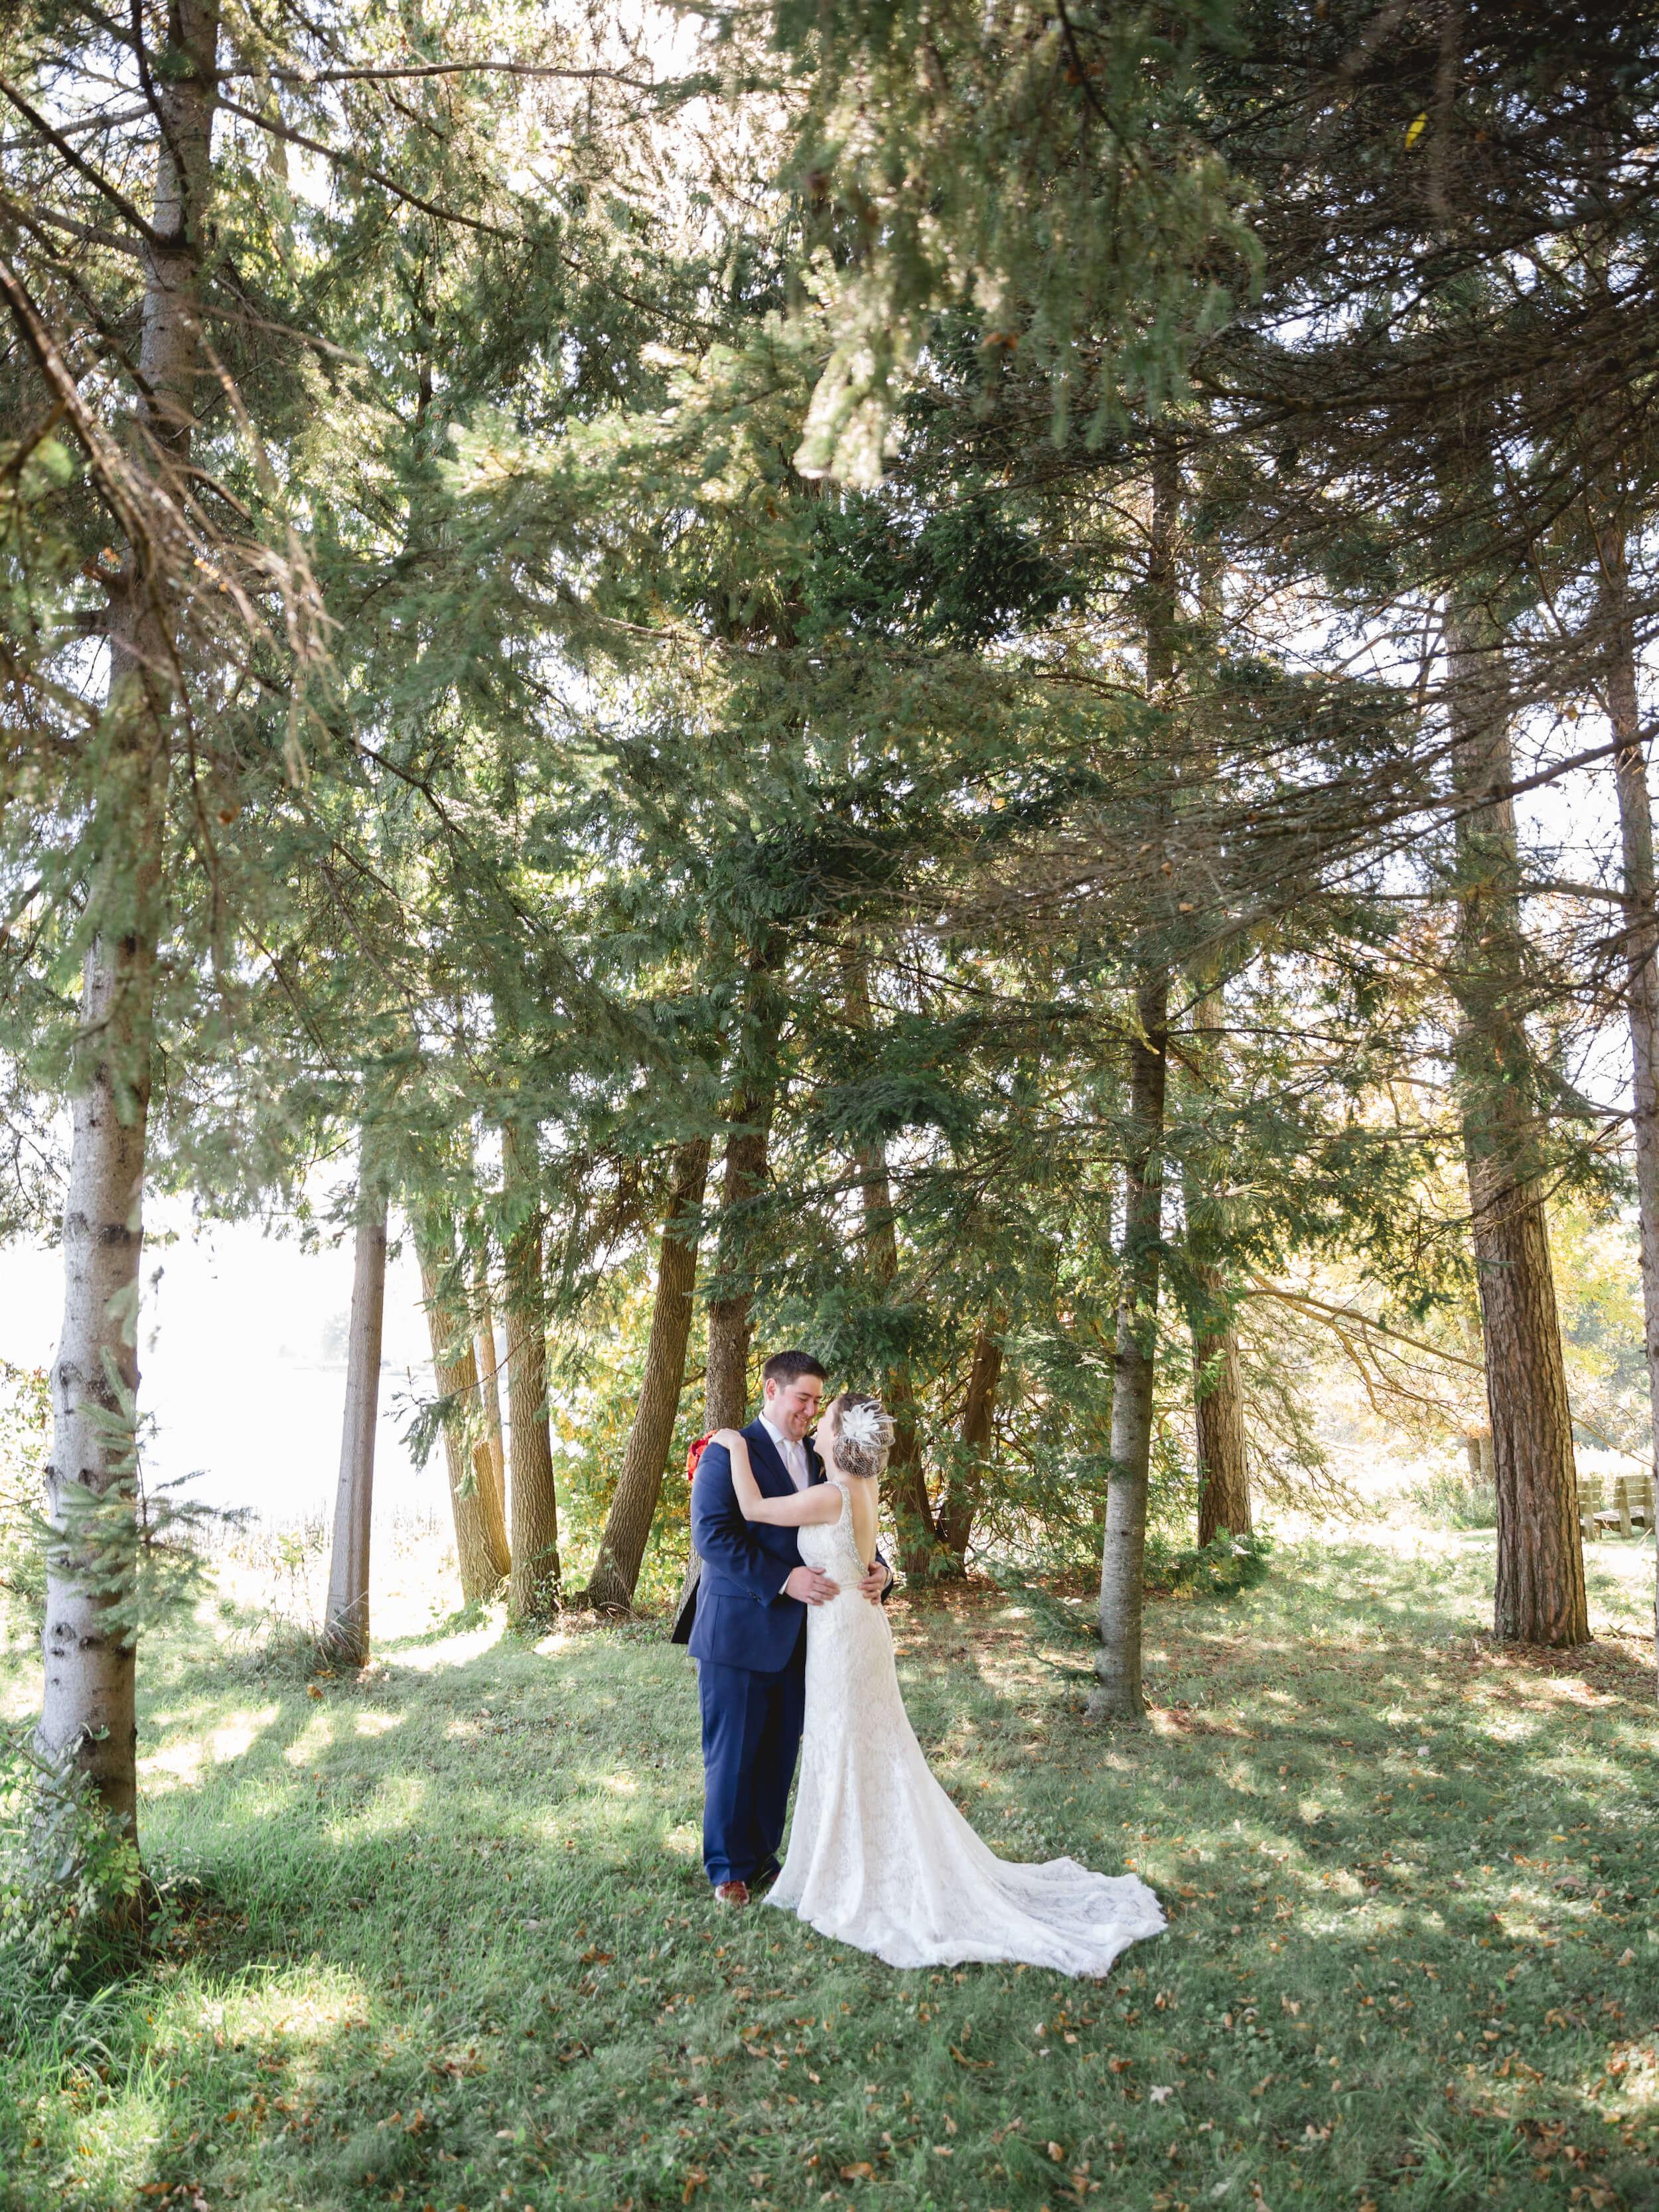 rochelle-louise-photography-acowsay-cinema-wisconsin-wedding-29.jpg